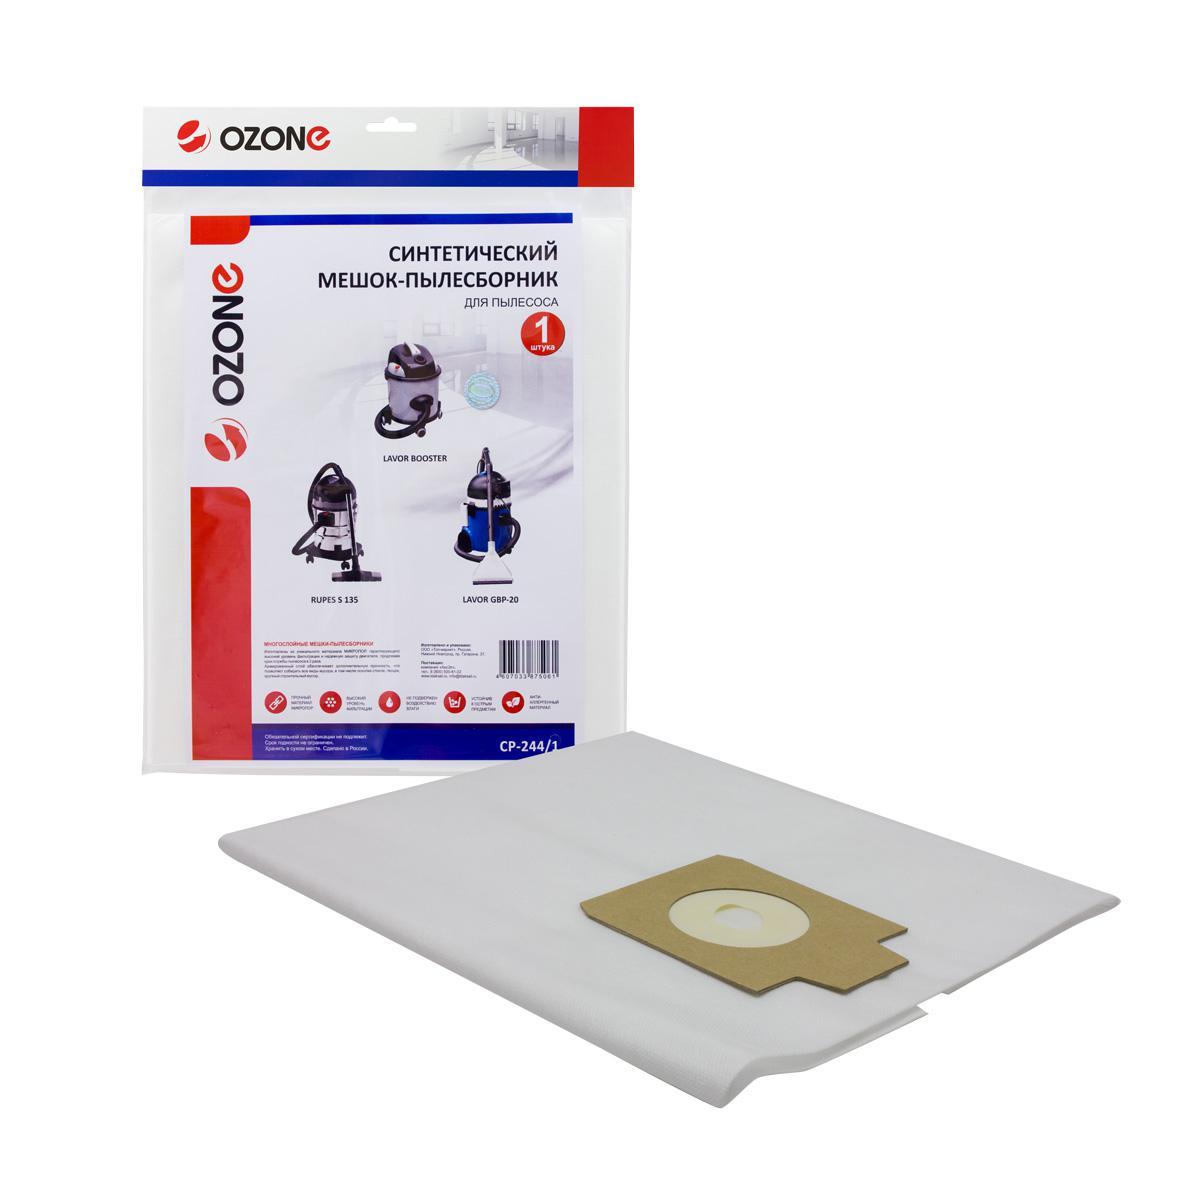 Мешок Ozone Cp-244/1 мешок ozone cp 232 2